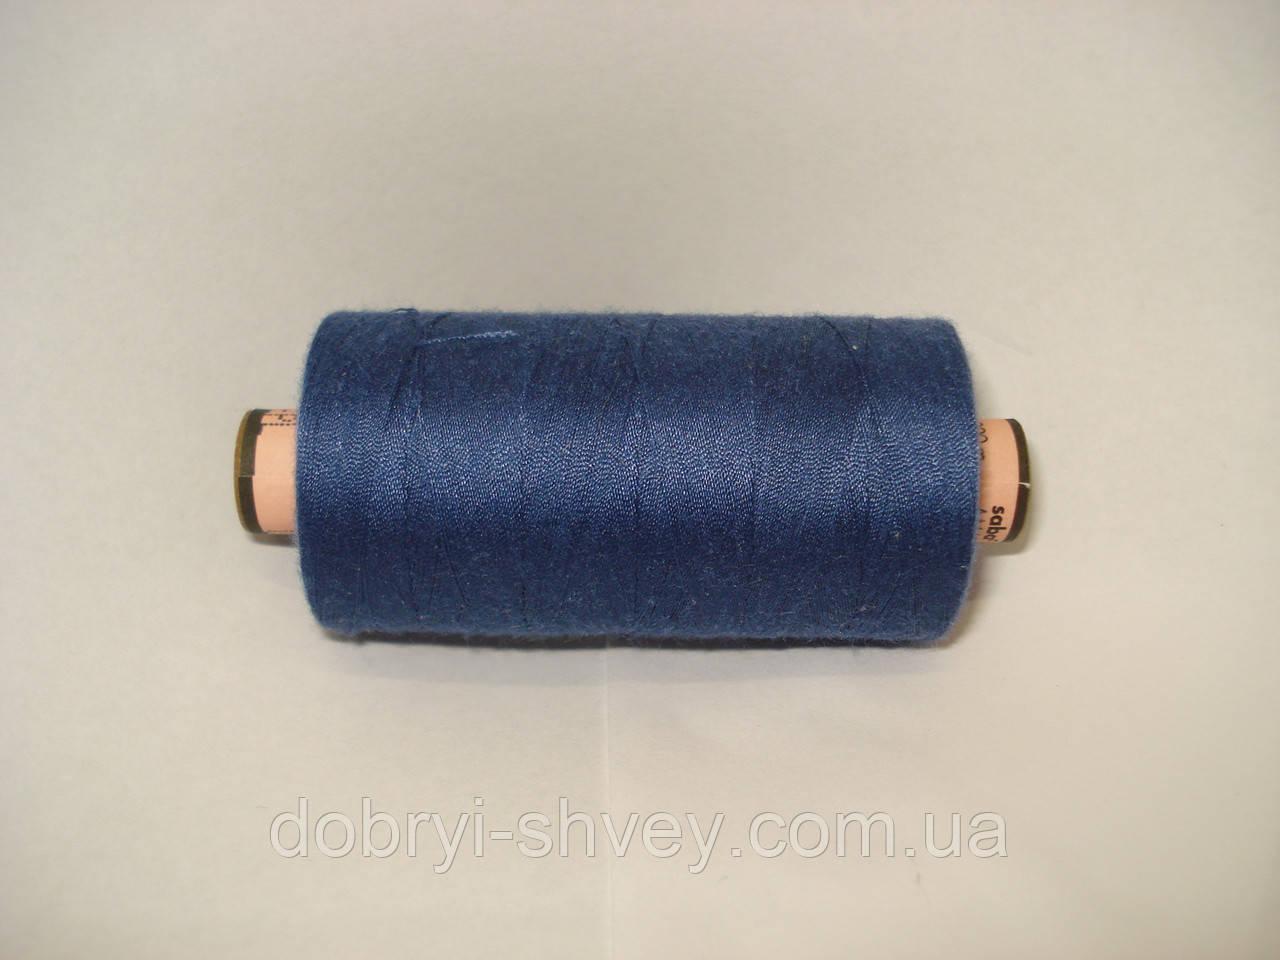 Нитка AMANN Saba c №120 1000м.col 0585 синий